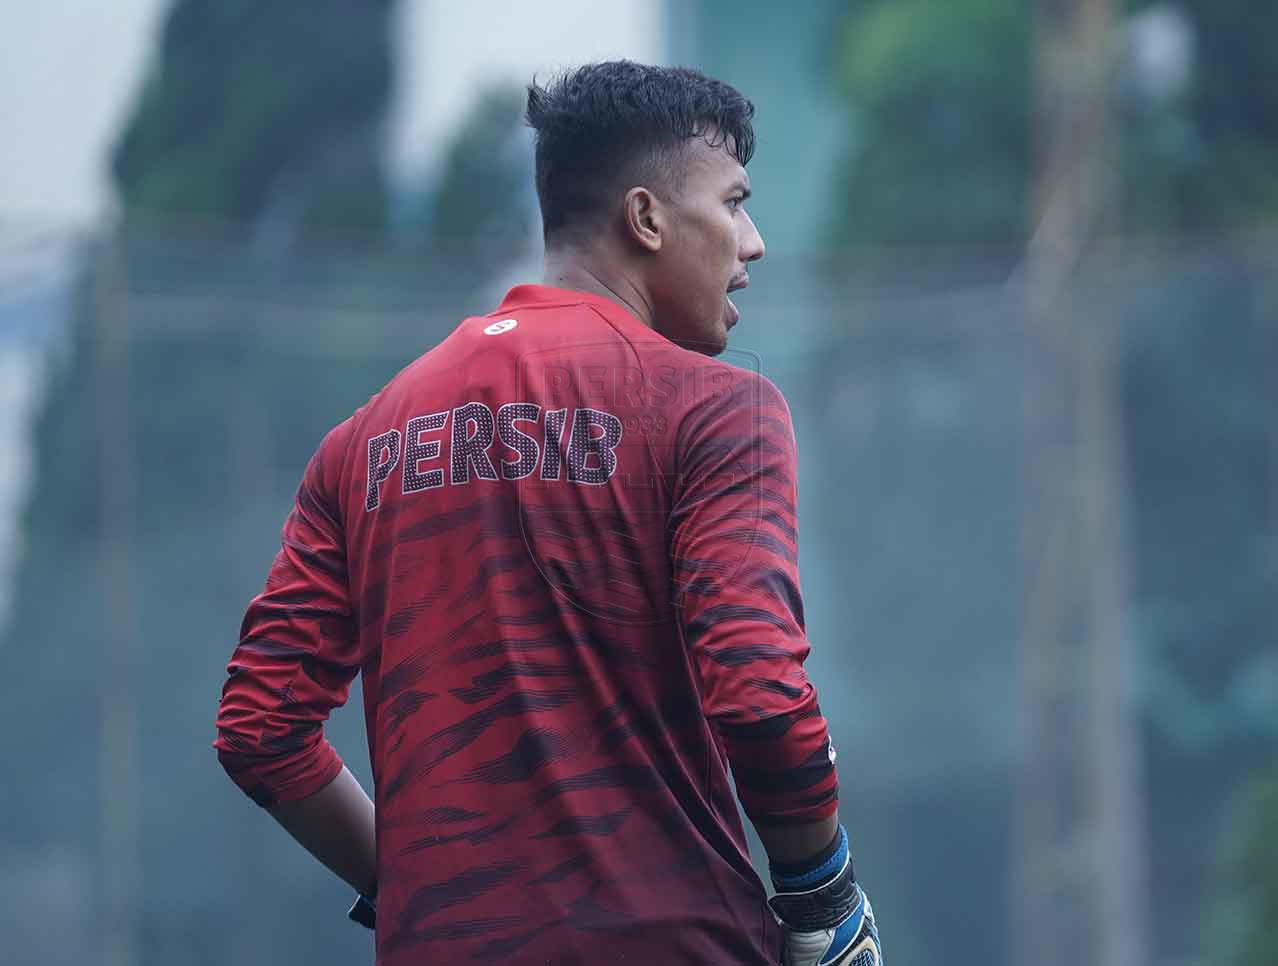 Kiper Persib Bandung, Teja Paku Alam. (Persib)